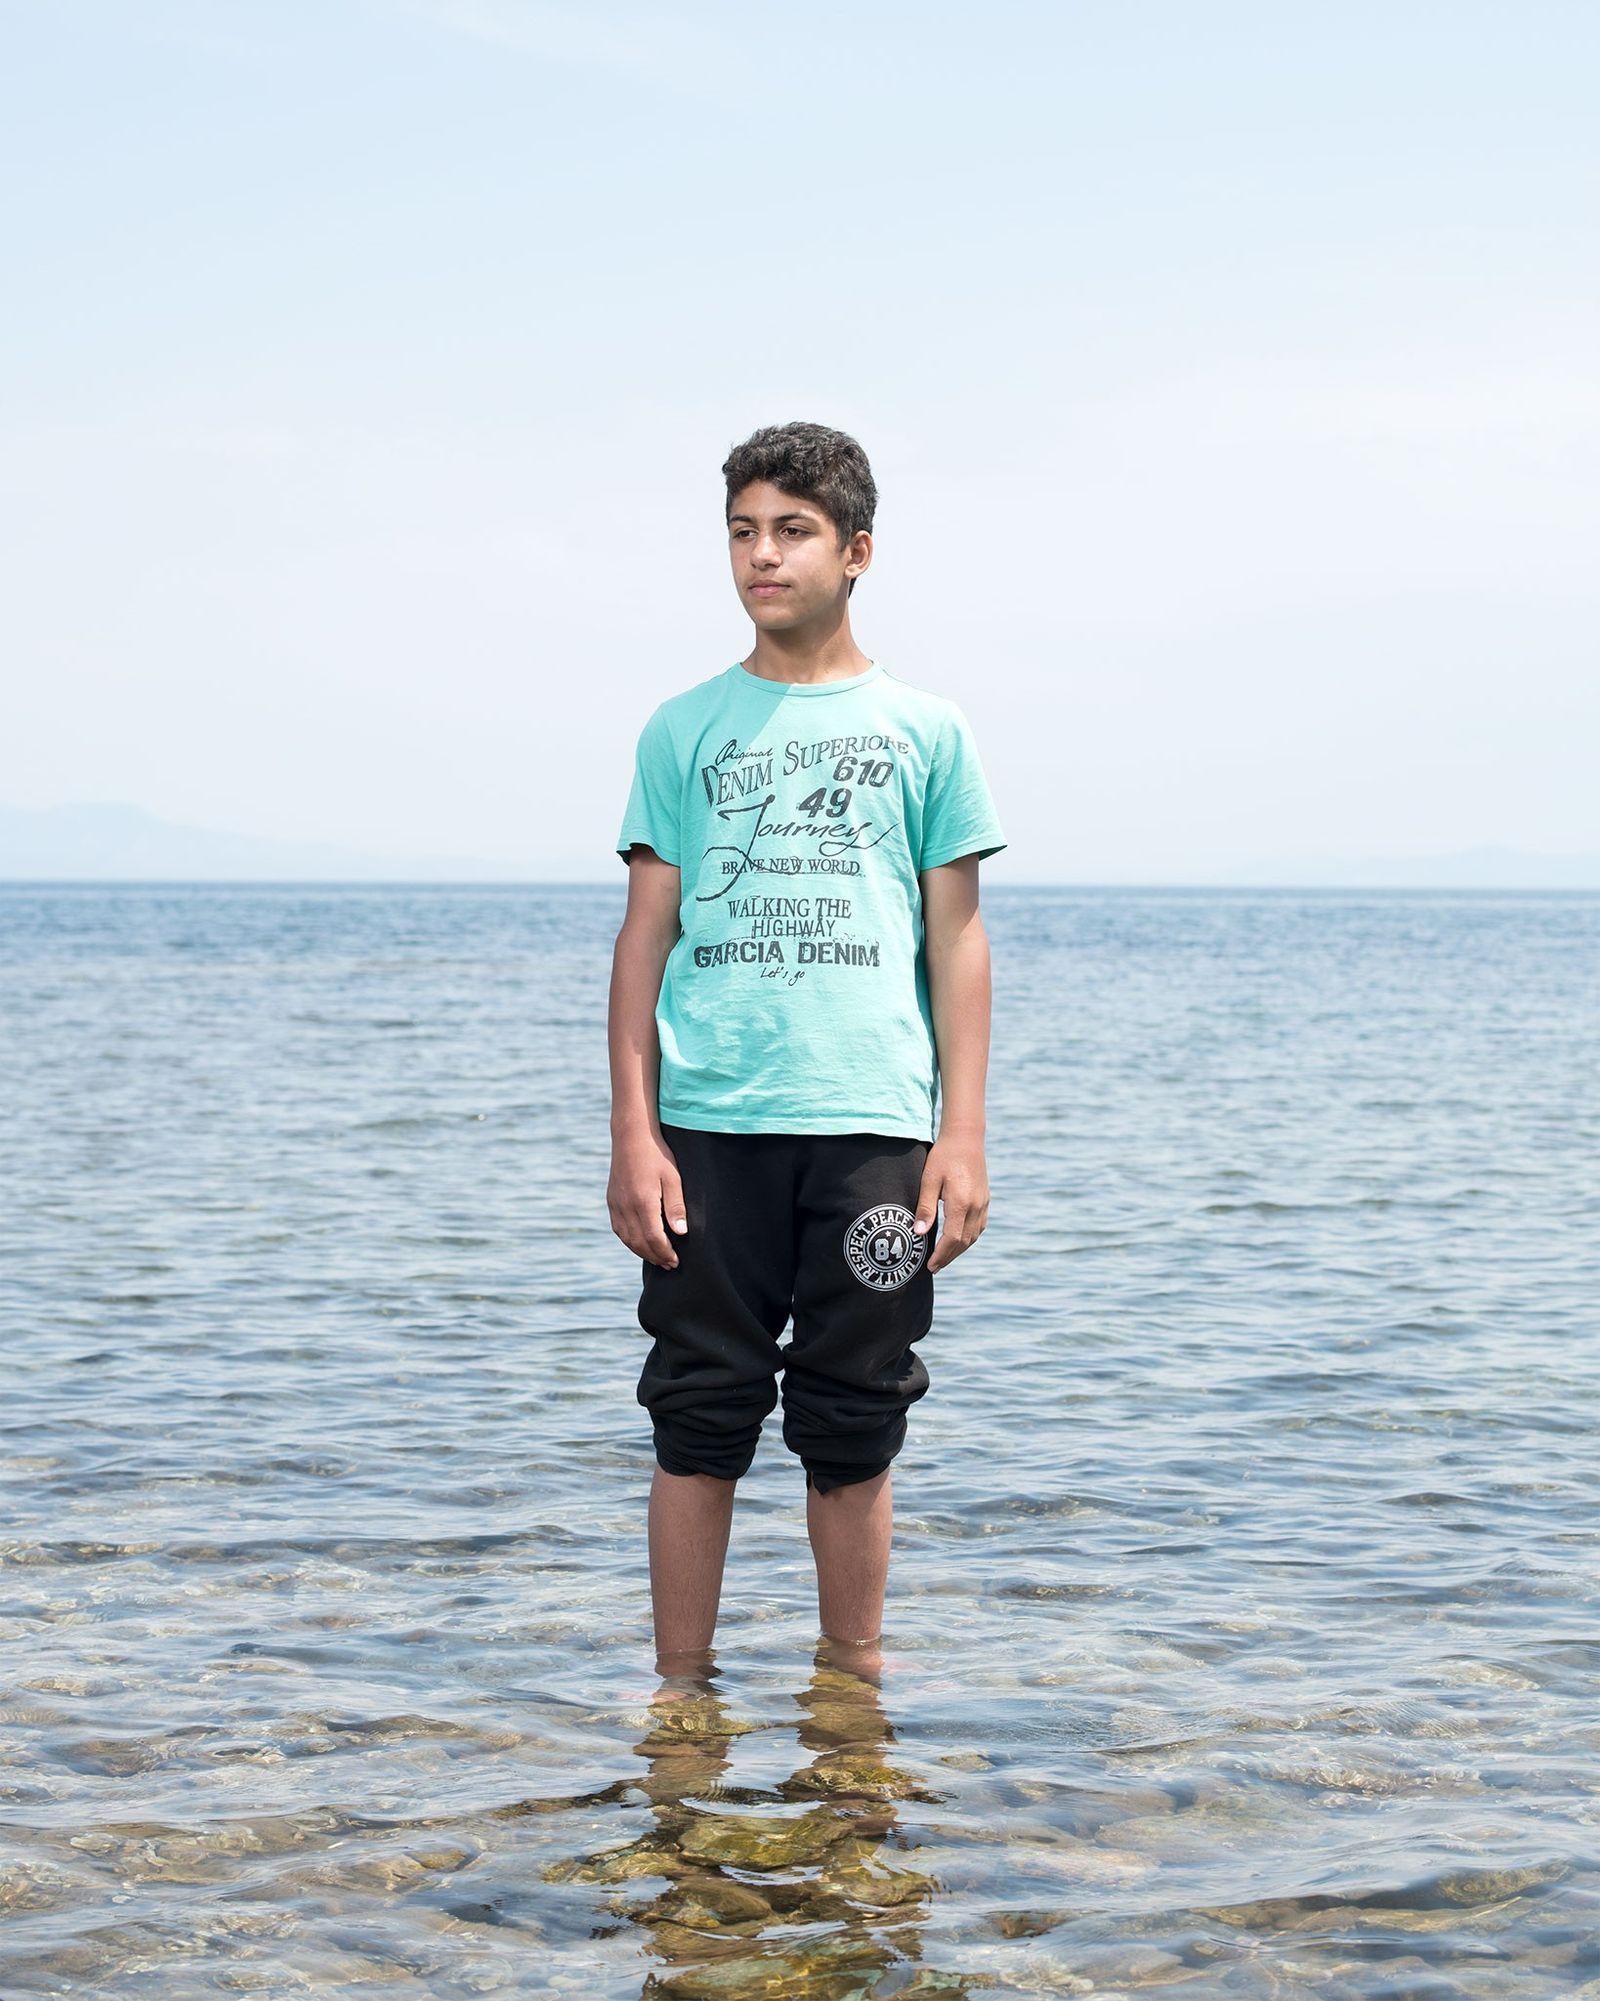 Paroles de réfugiés